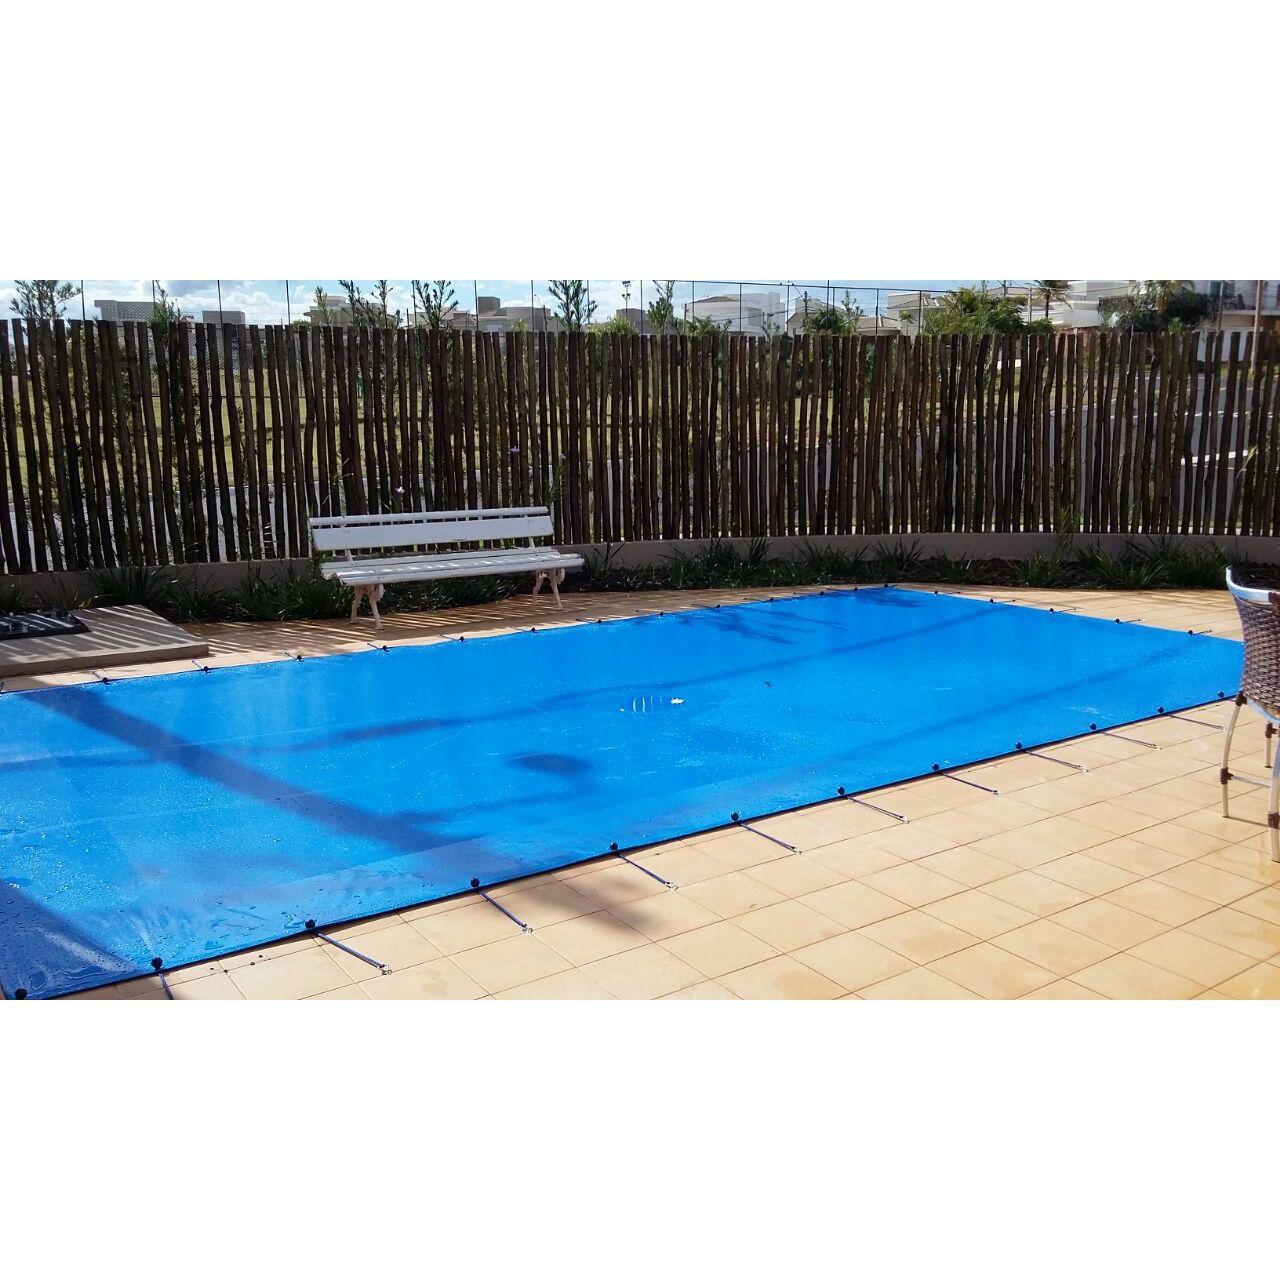 Lona Polietileno Azul 300 Micras - 6x4,5